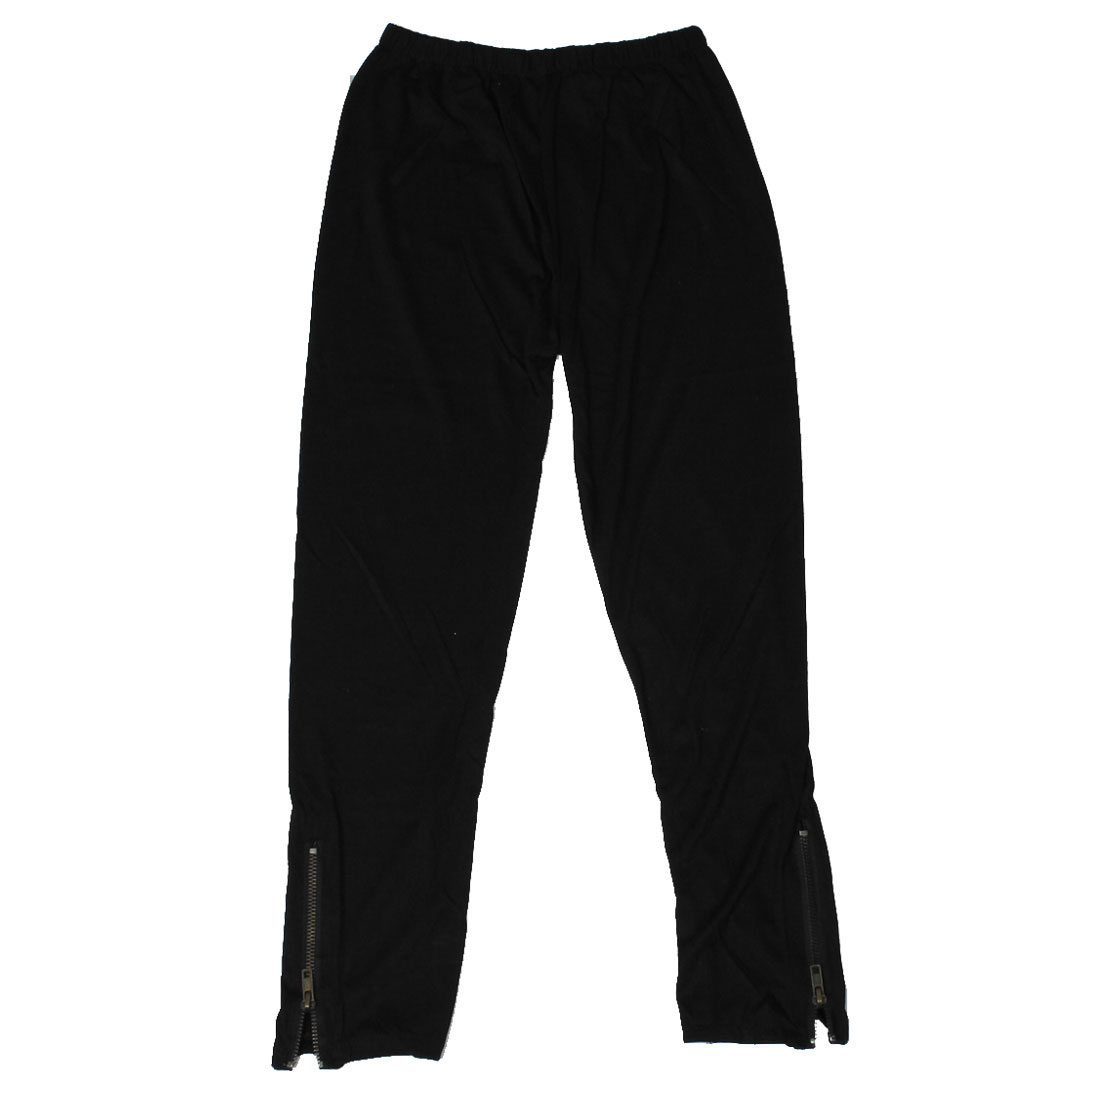 Ladies Zippers Decor Bottom Elastic Waist Black Skinny Cropped Pants XS